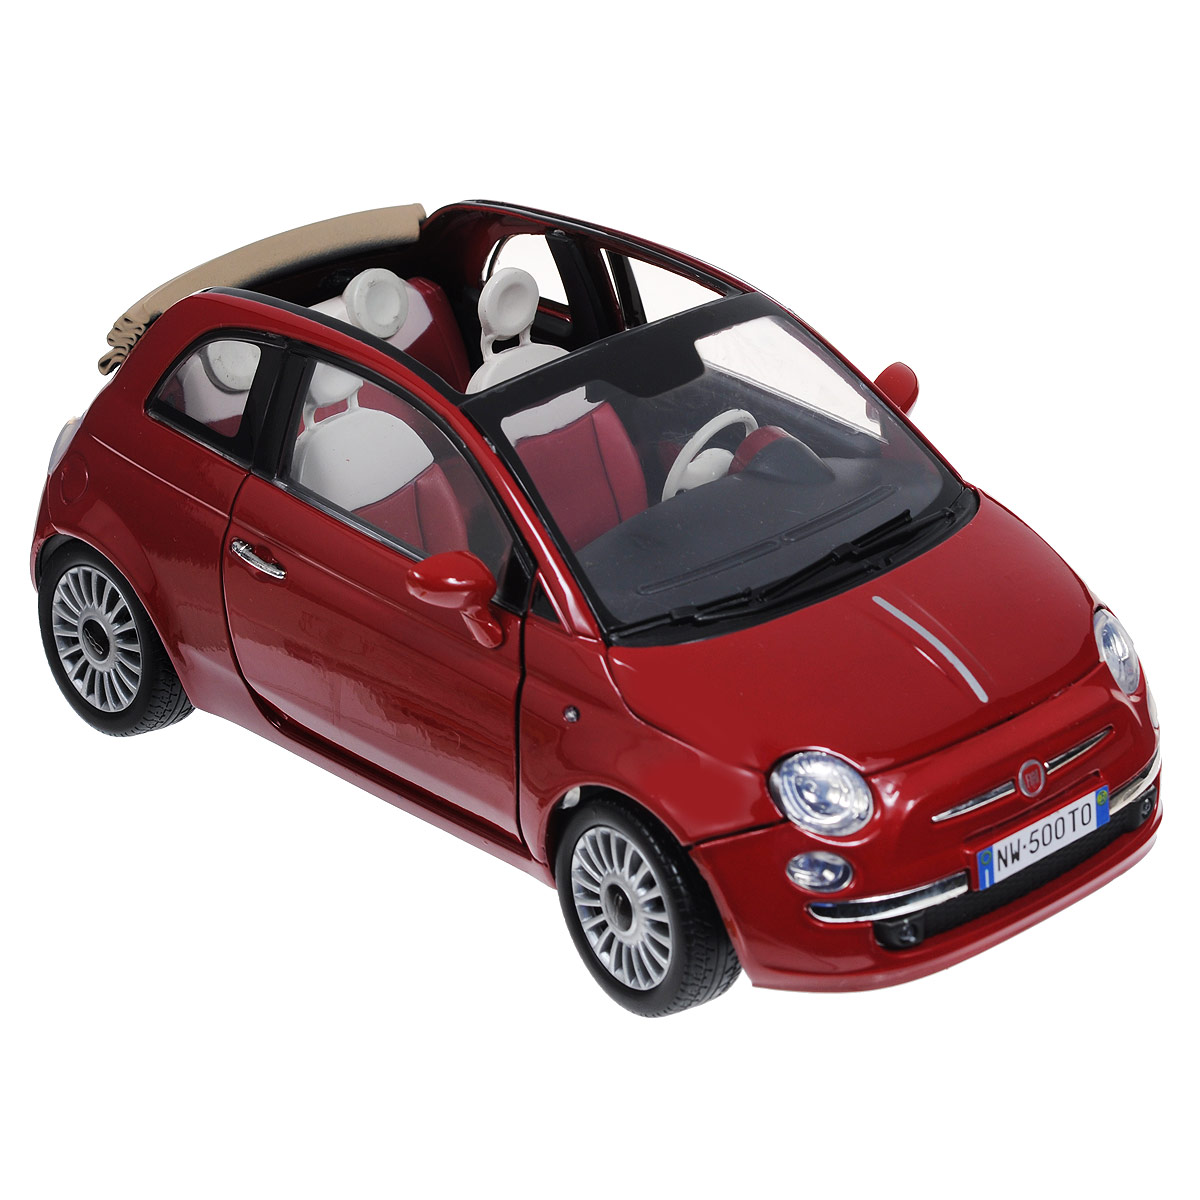 MotorMax Модель автомобиля Fiat Nuova 500 Cabrio цвет красный игрушка chicco turbo touch fiat 500 abarth 2 00007331000000